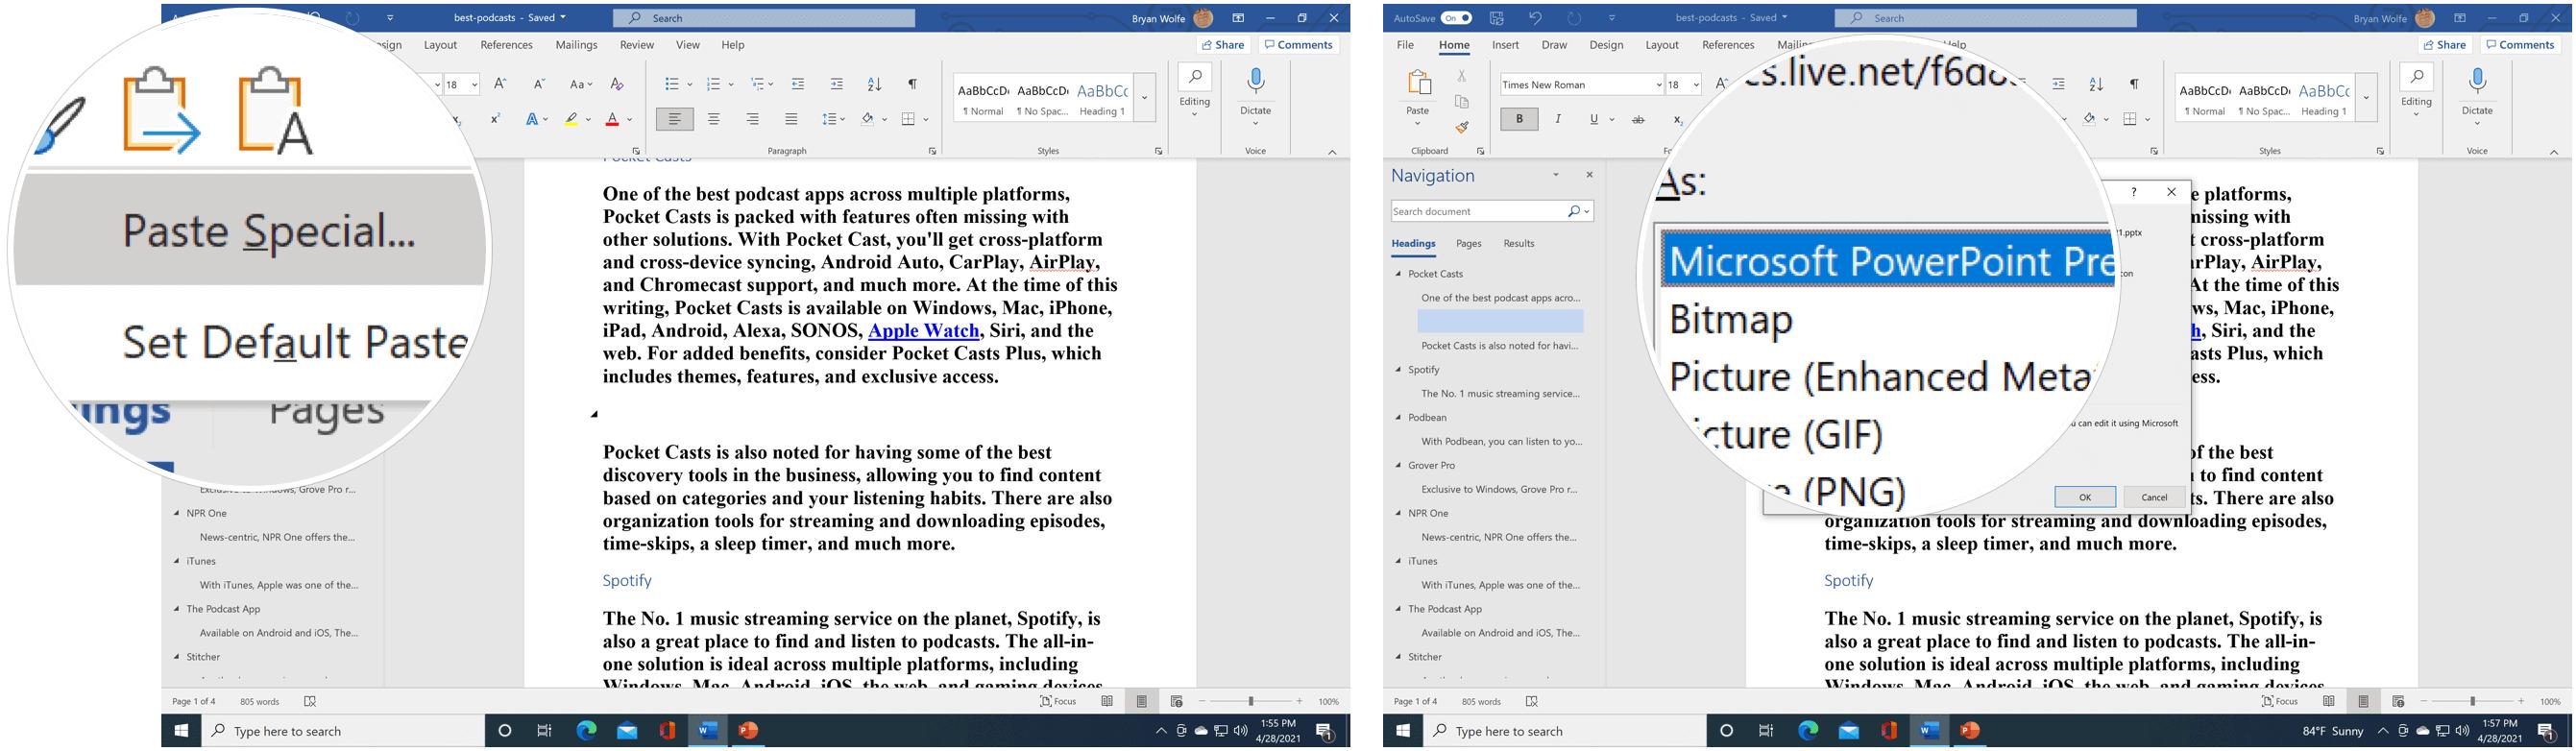 Sematkan PowerPoint Slide PowerPoint yang disematkan